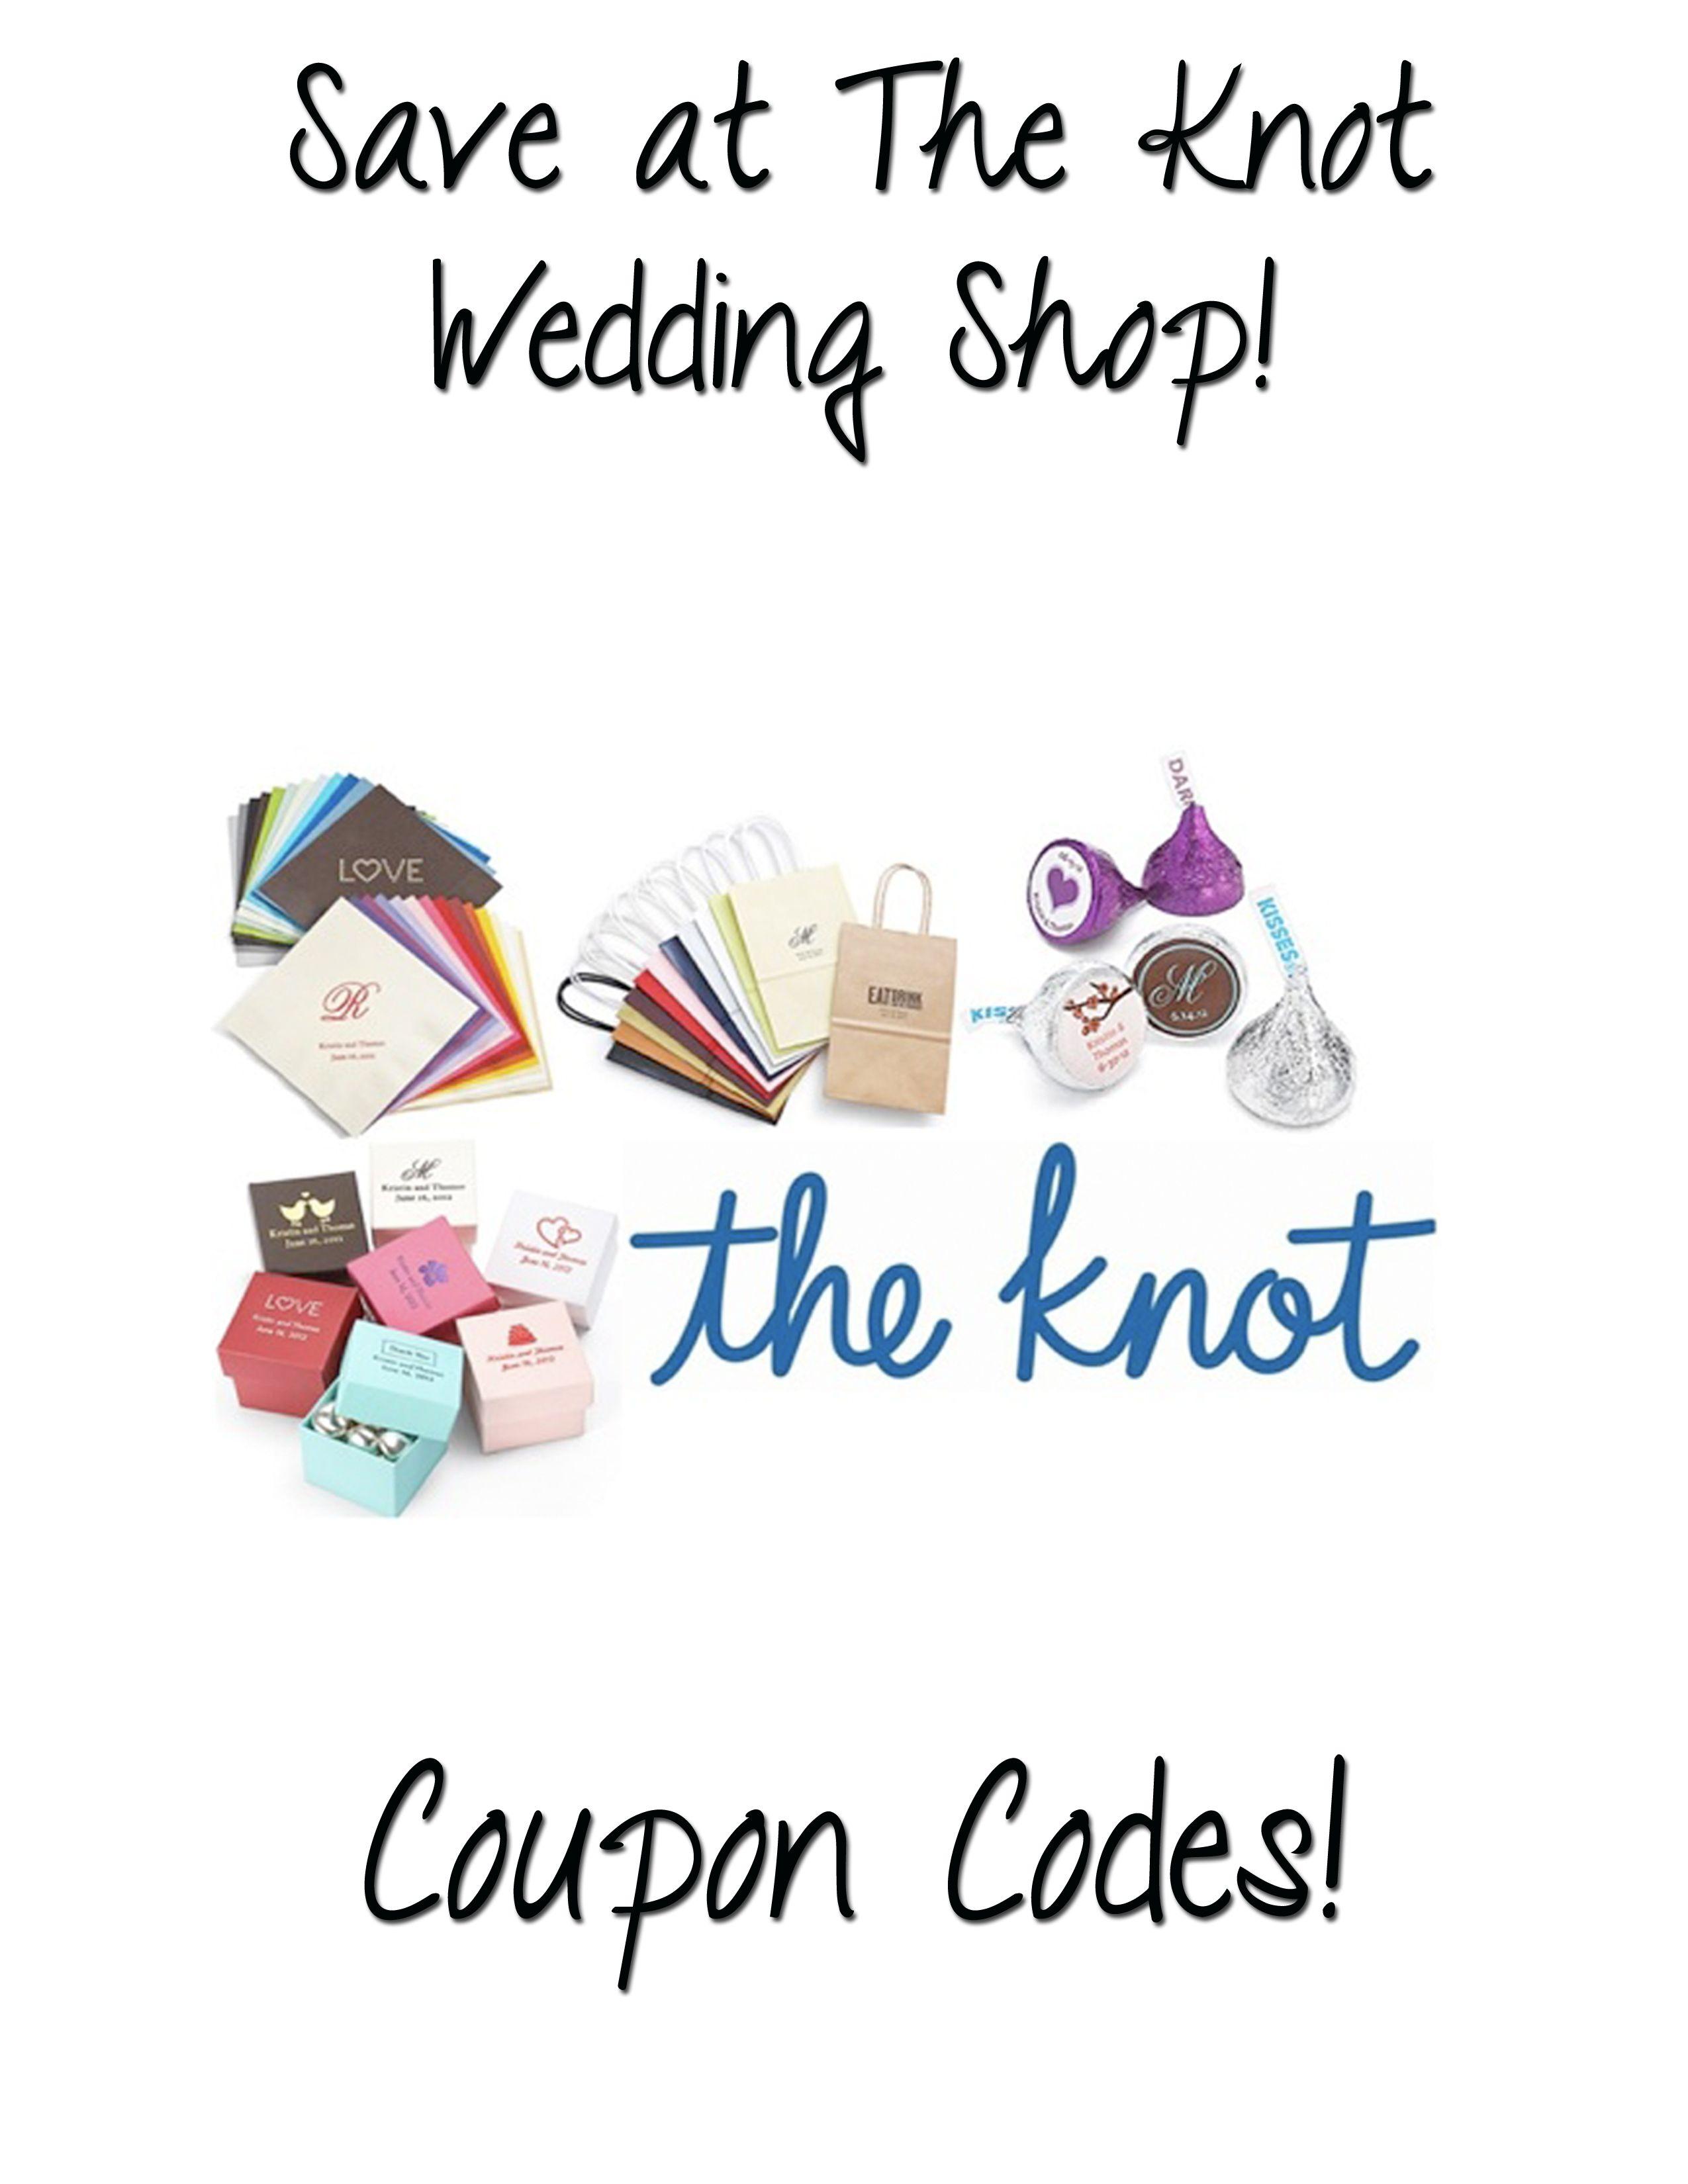 The Knot Wedding Shop Coupon Codes Wedding shop